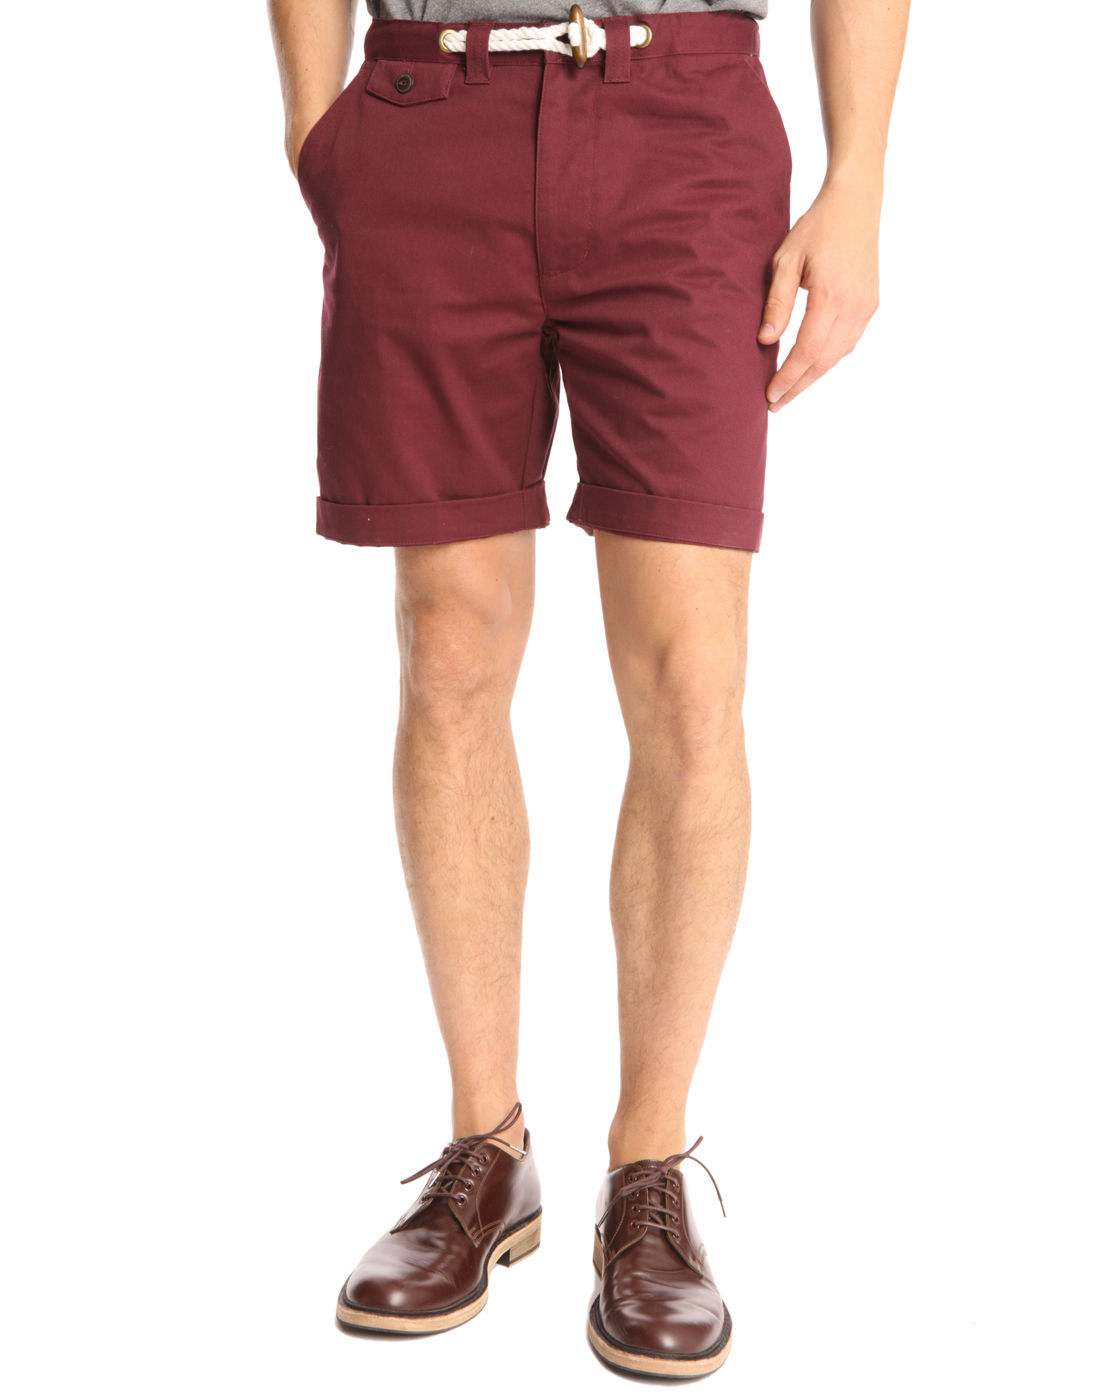 Maroon Shorts For Men